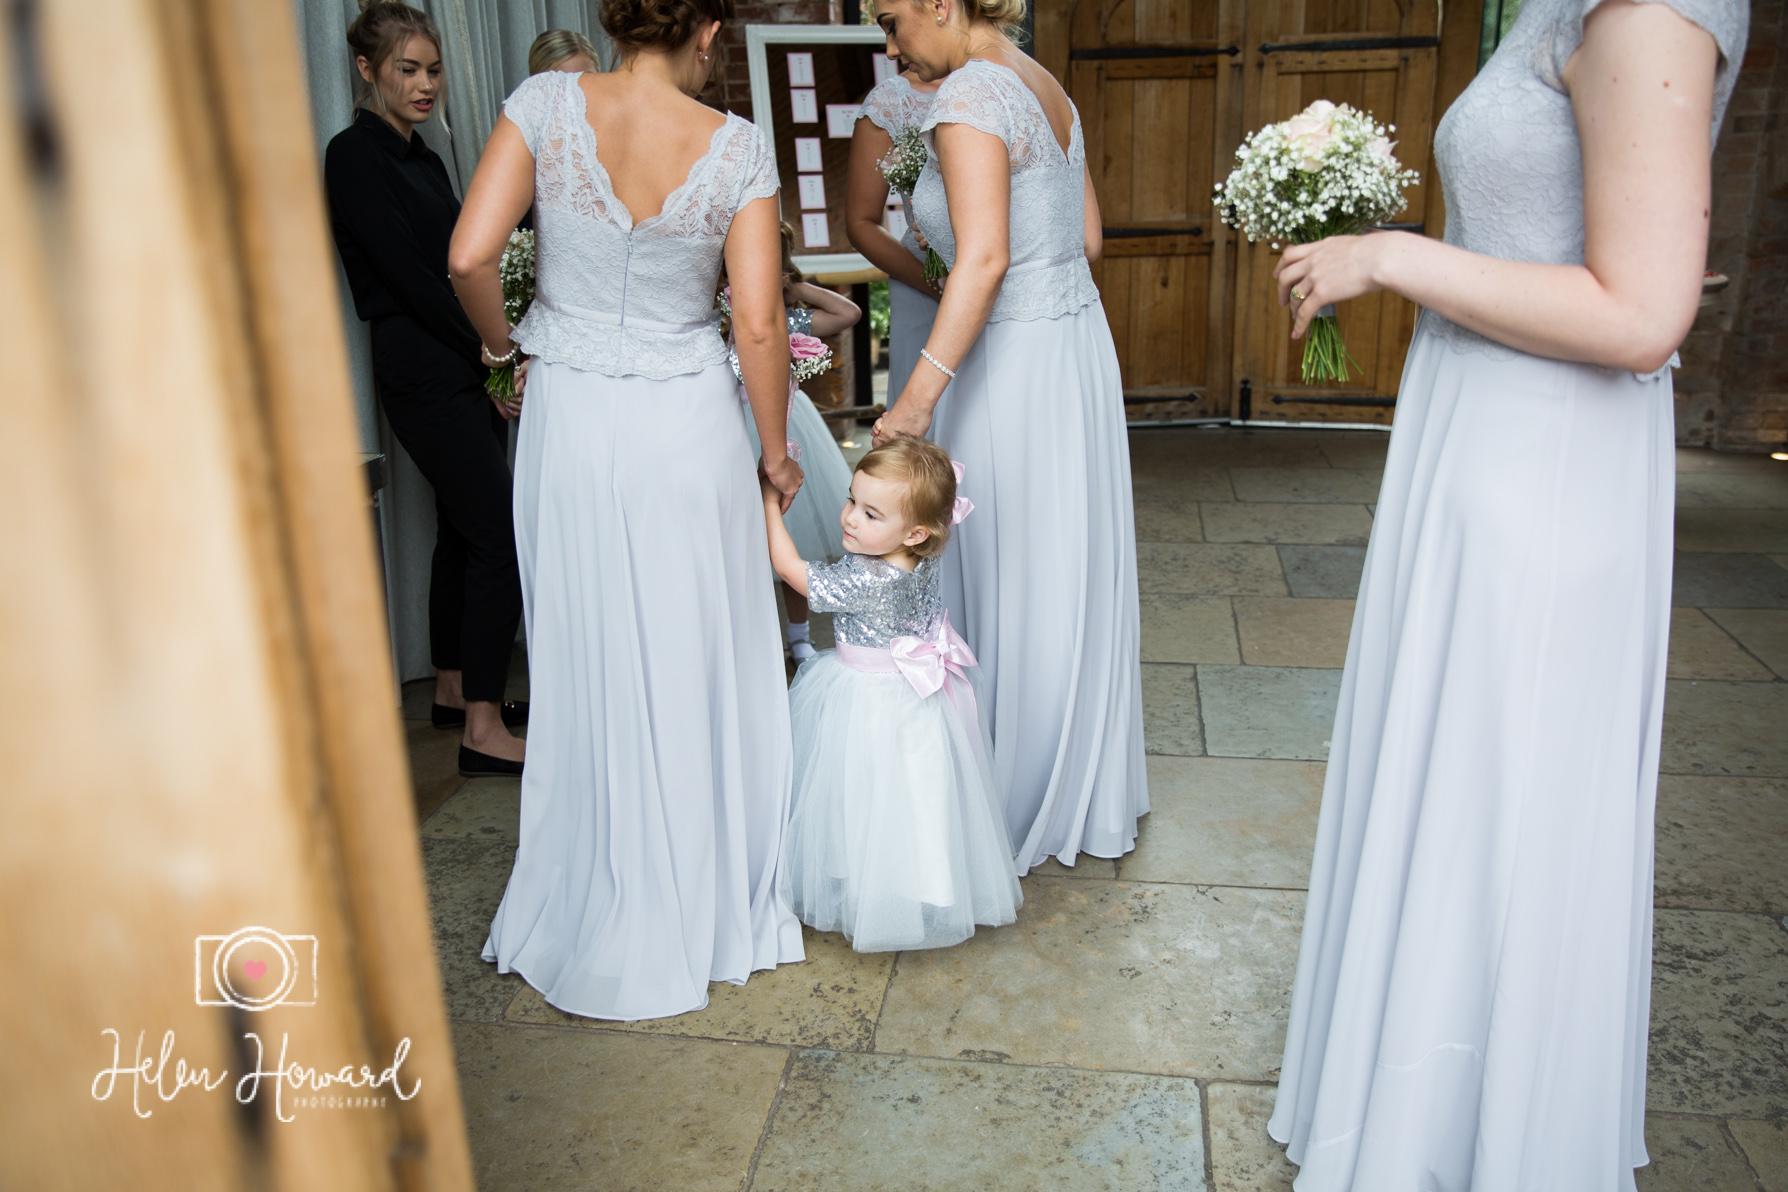 Shustoke Farm Barns Wedding Photography by Helen Howard-12.jpg